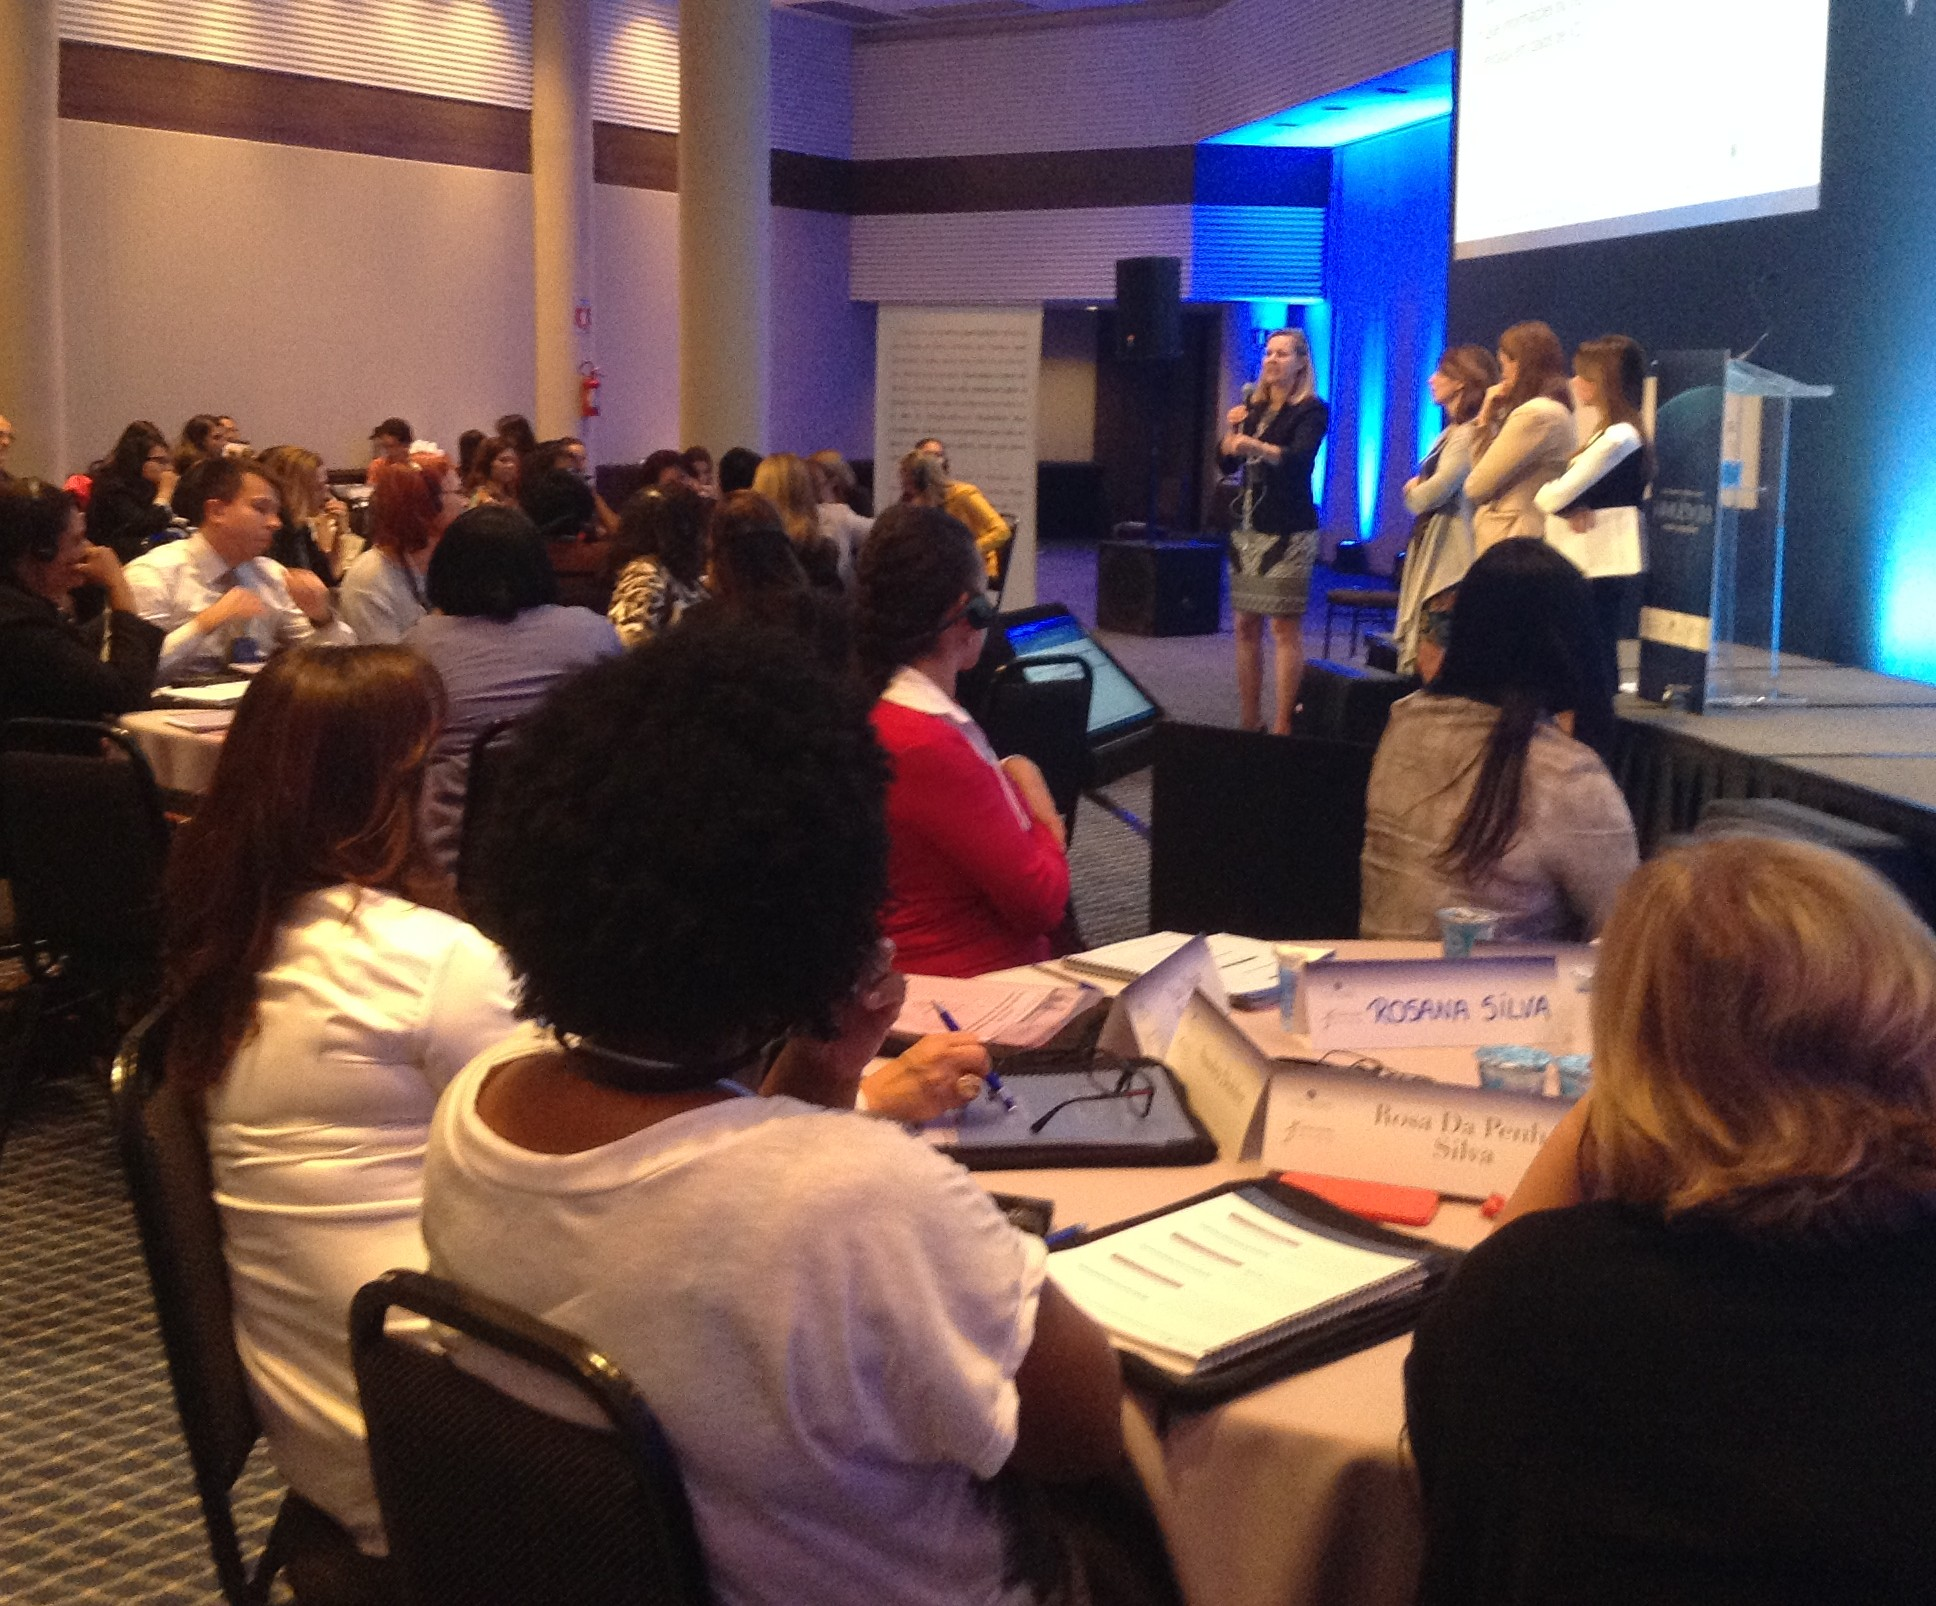 Workshop Internacional Violência contra as Mulheres - trabalhos em grupoWorkshop Internacional Violência contra as Mulheres - trabalhos em grupo